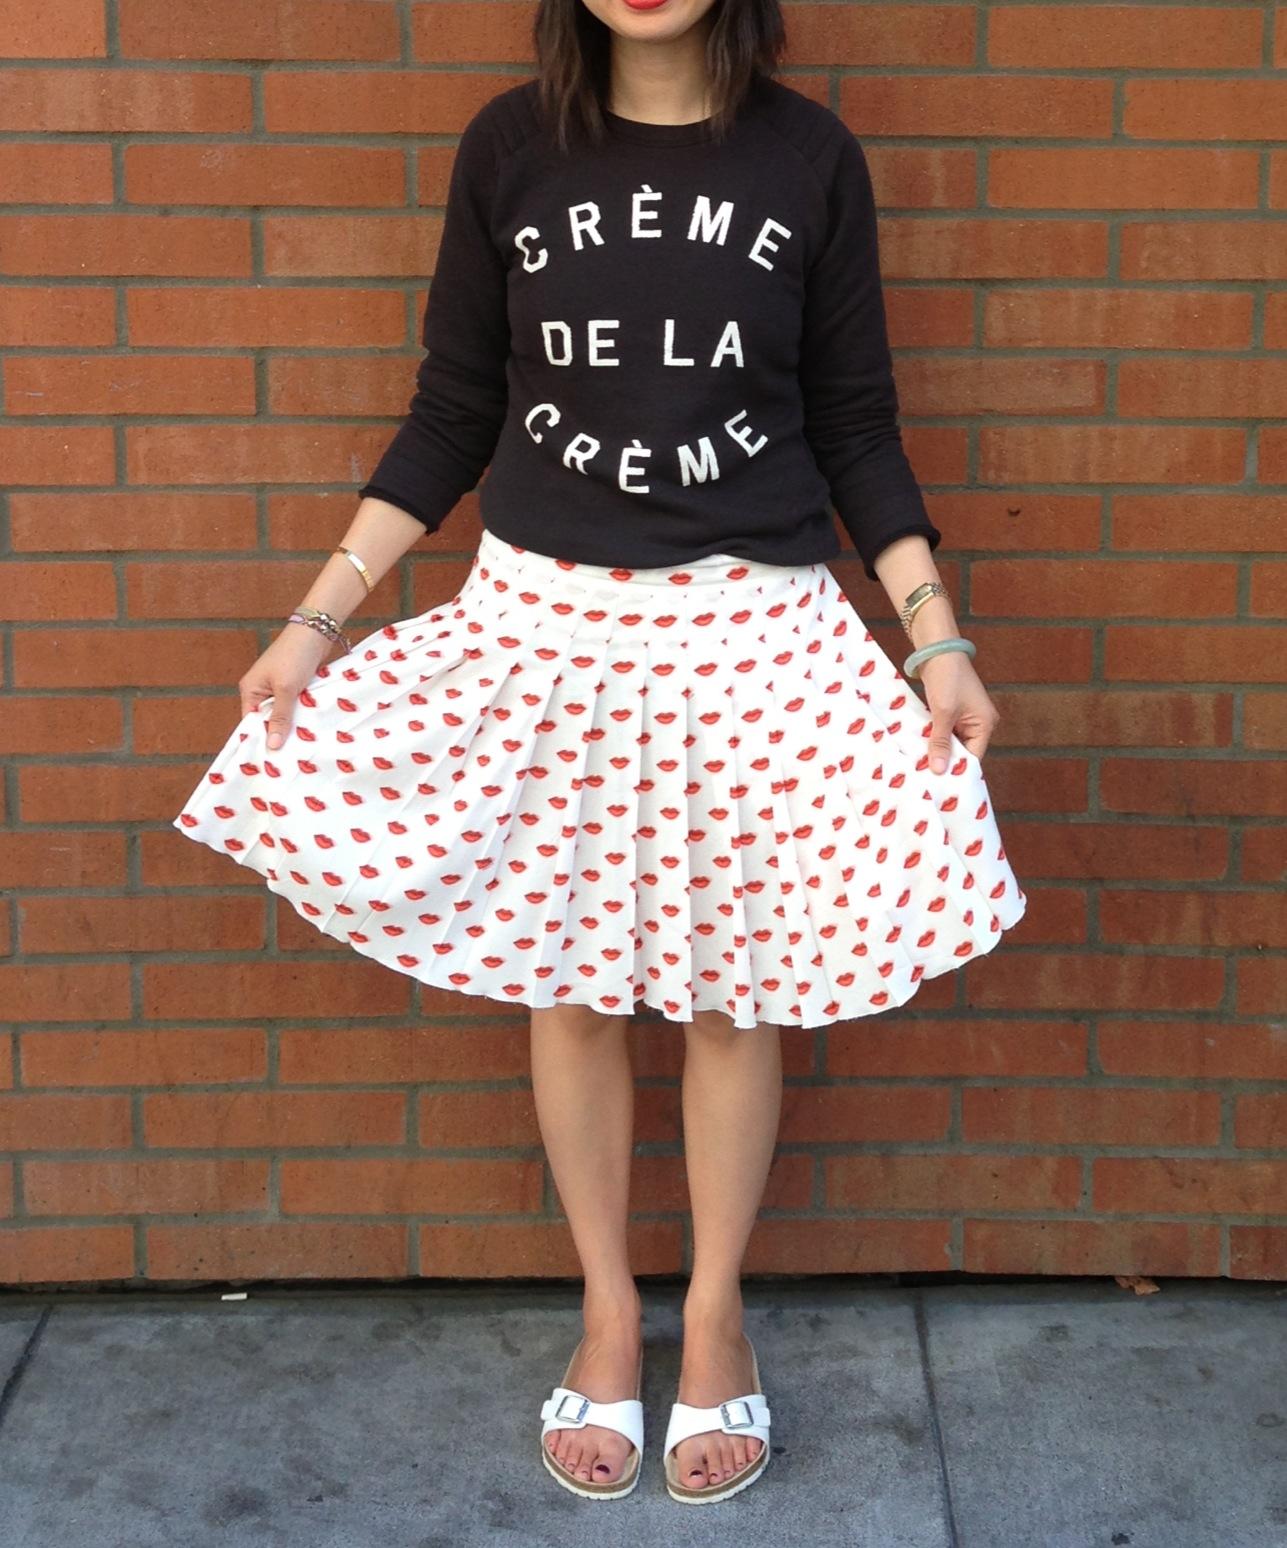 356e61fdc04 zoe karssen creme de la creme sweatshirt and prada lips print pleated skirt  with white birkenstocks